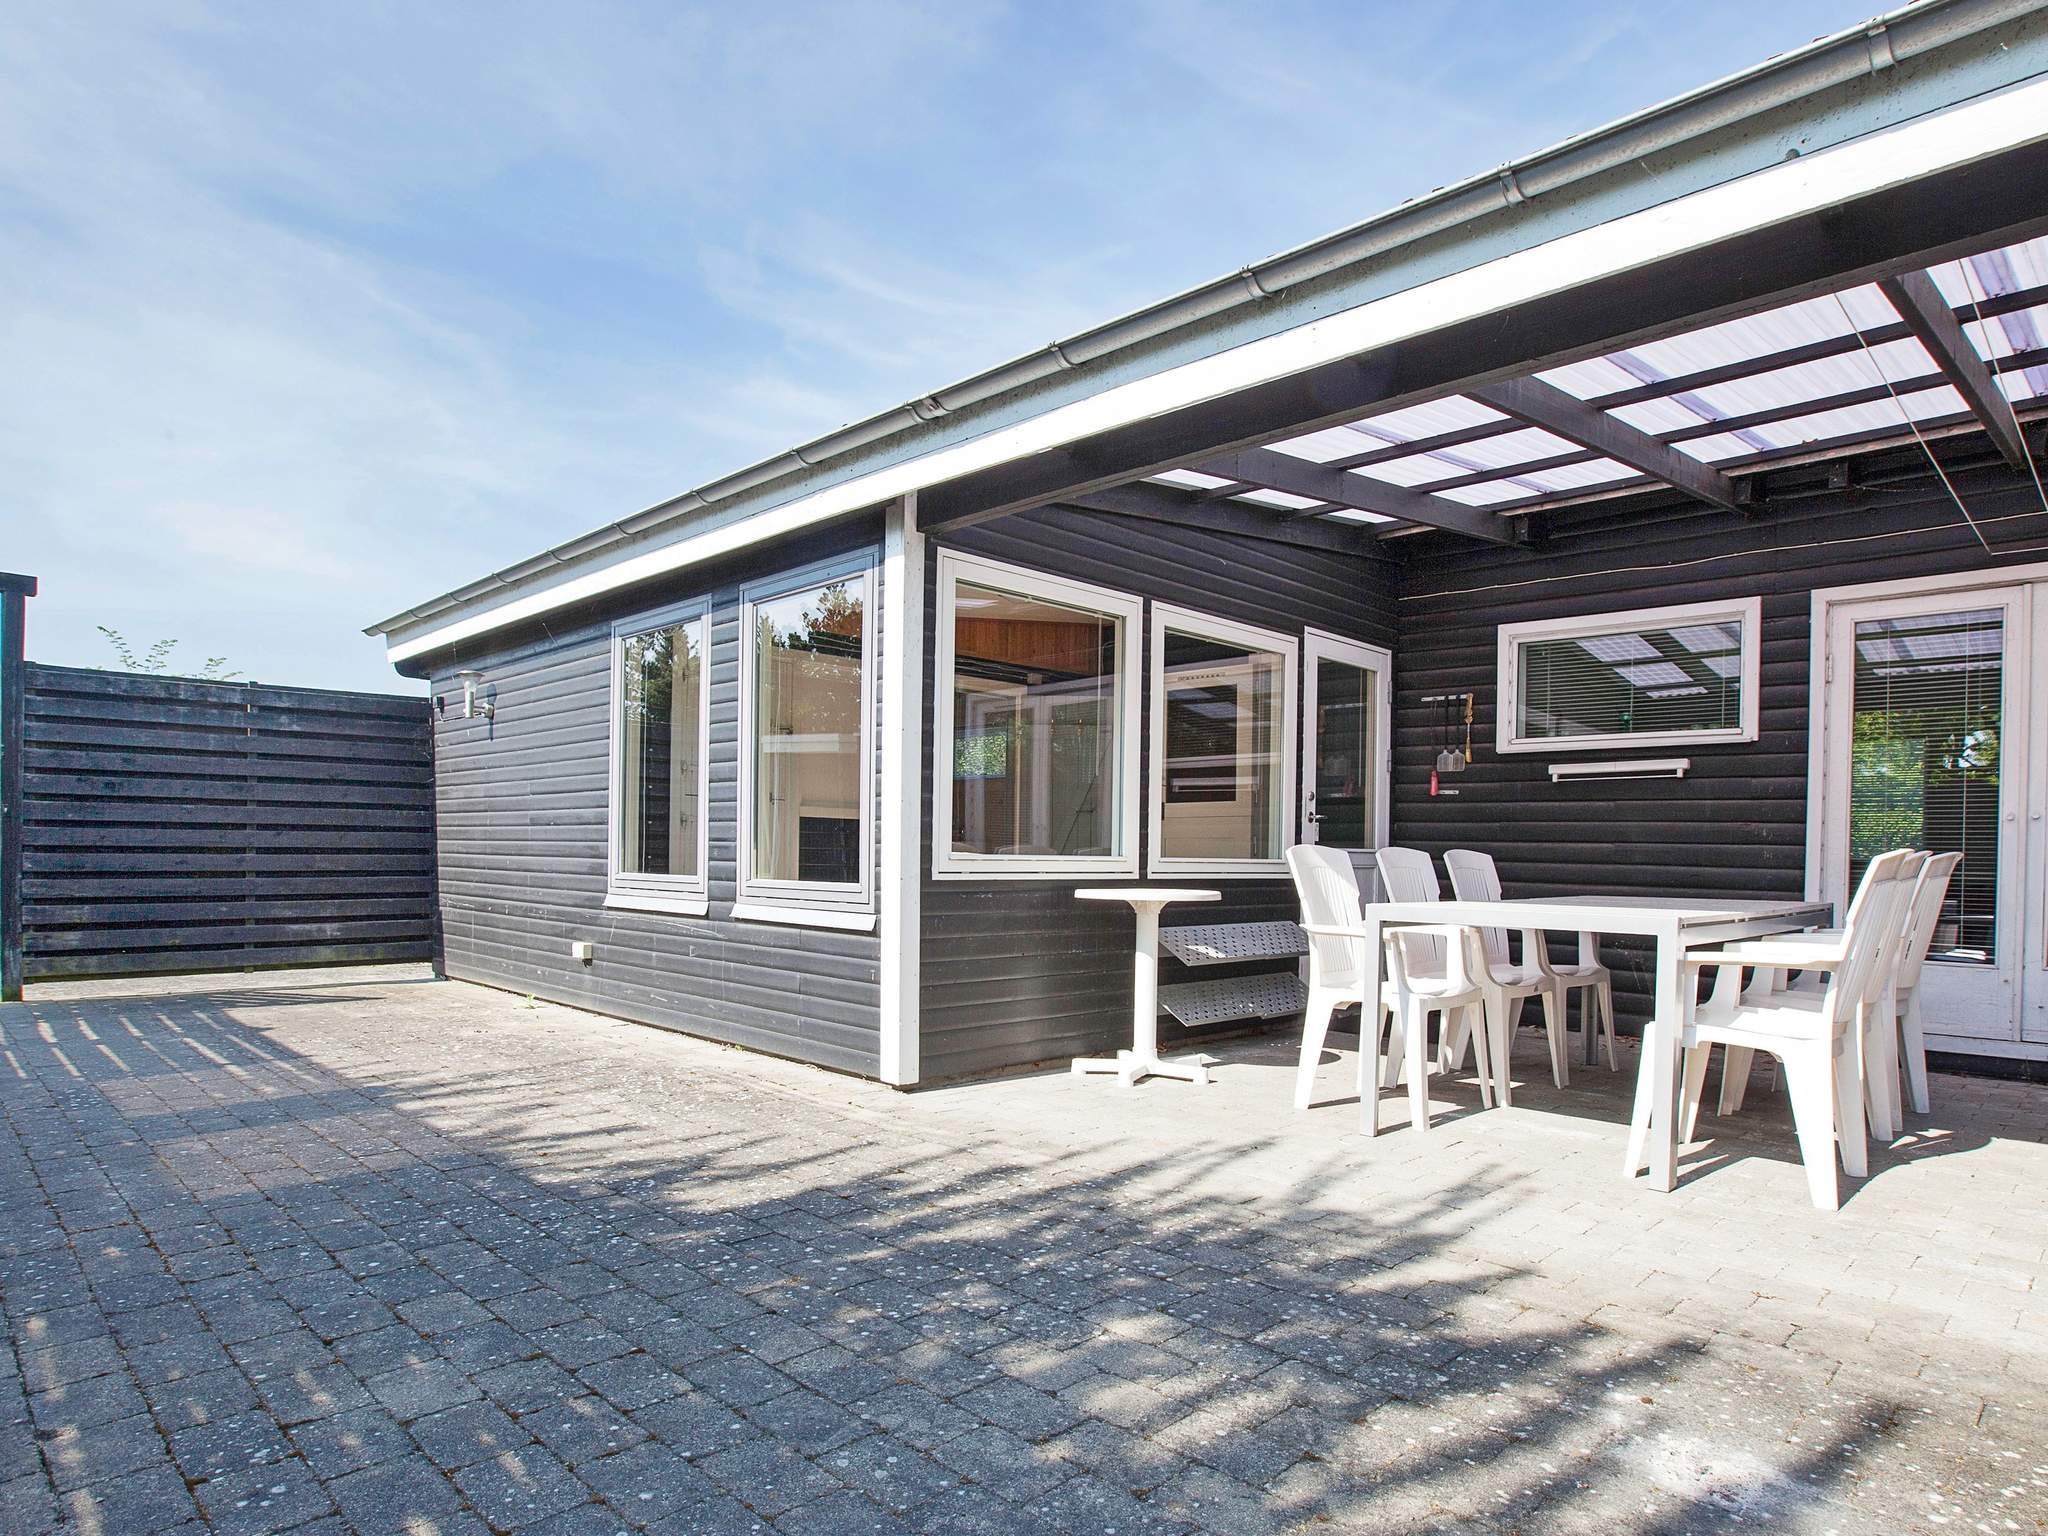 Maison de vacances Næsby Strand/Lolland (93211), Næsby, , Lolland, Danemark, image 1